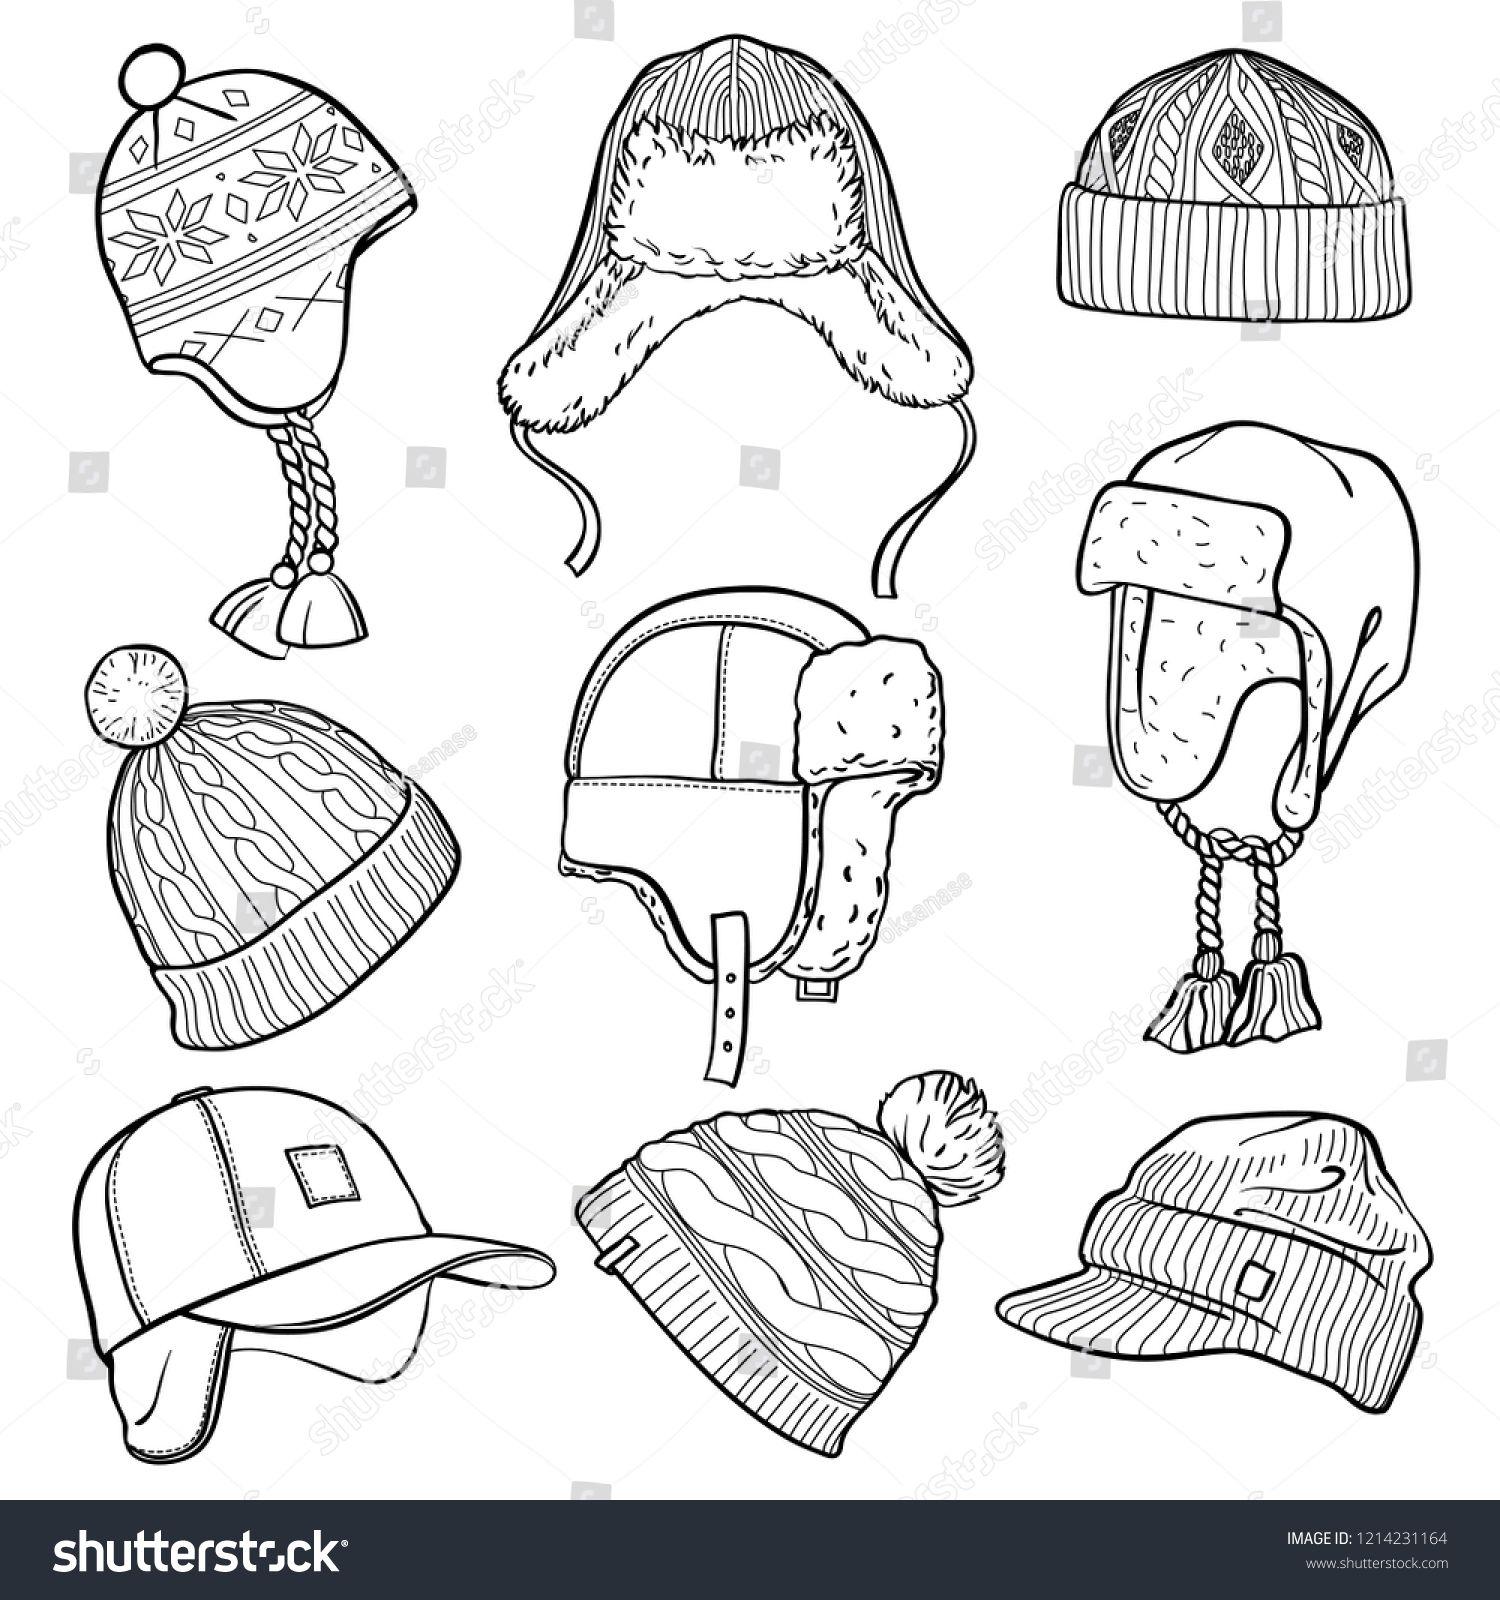 Set of 9 winter caps and hats sketches: baseball cap, ear.